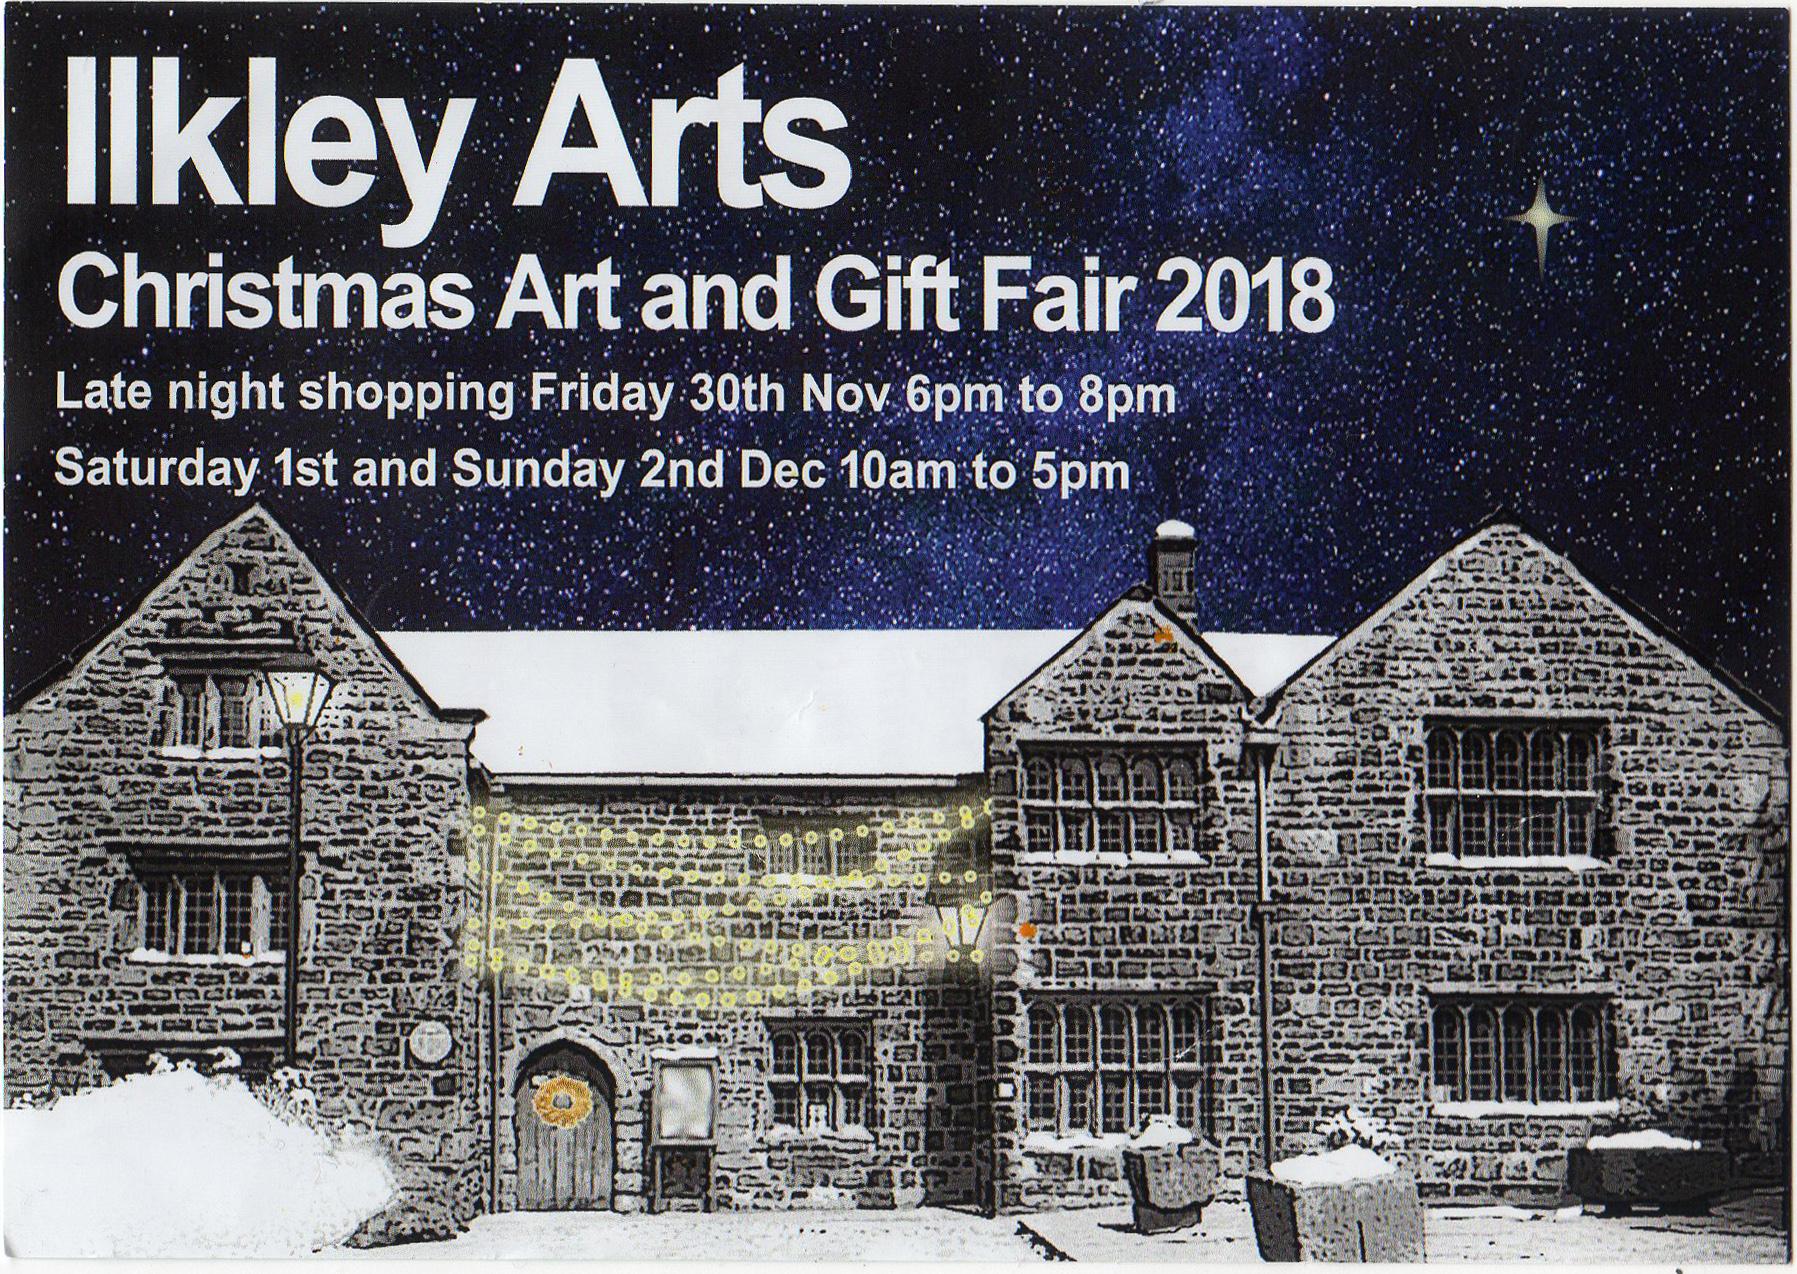 ilkley arts fair 2018.jpg